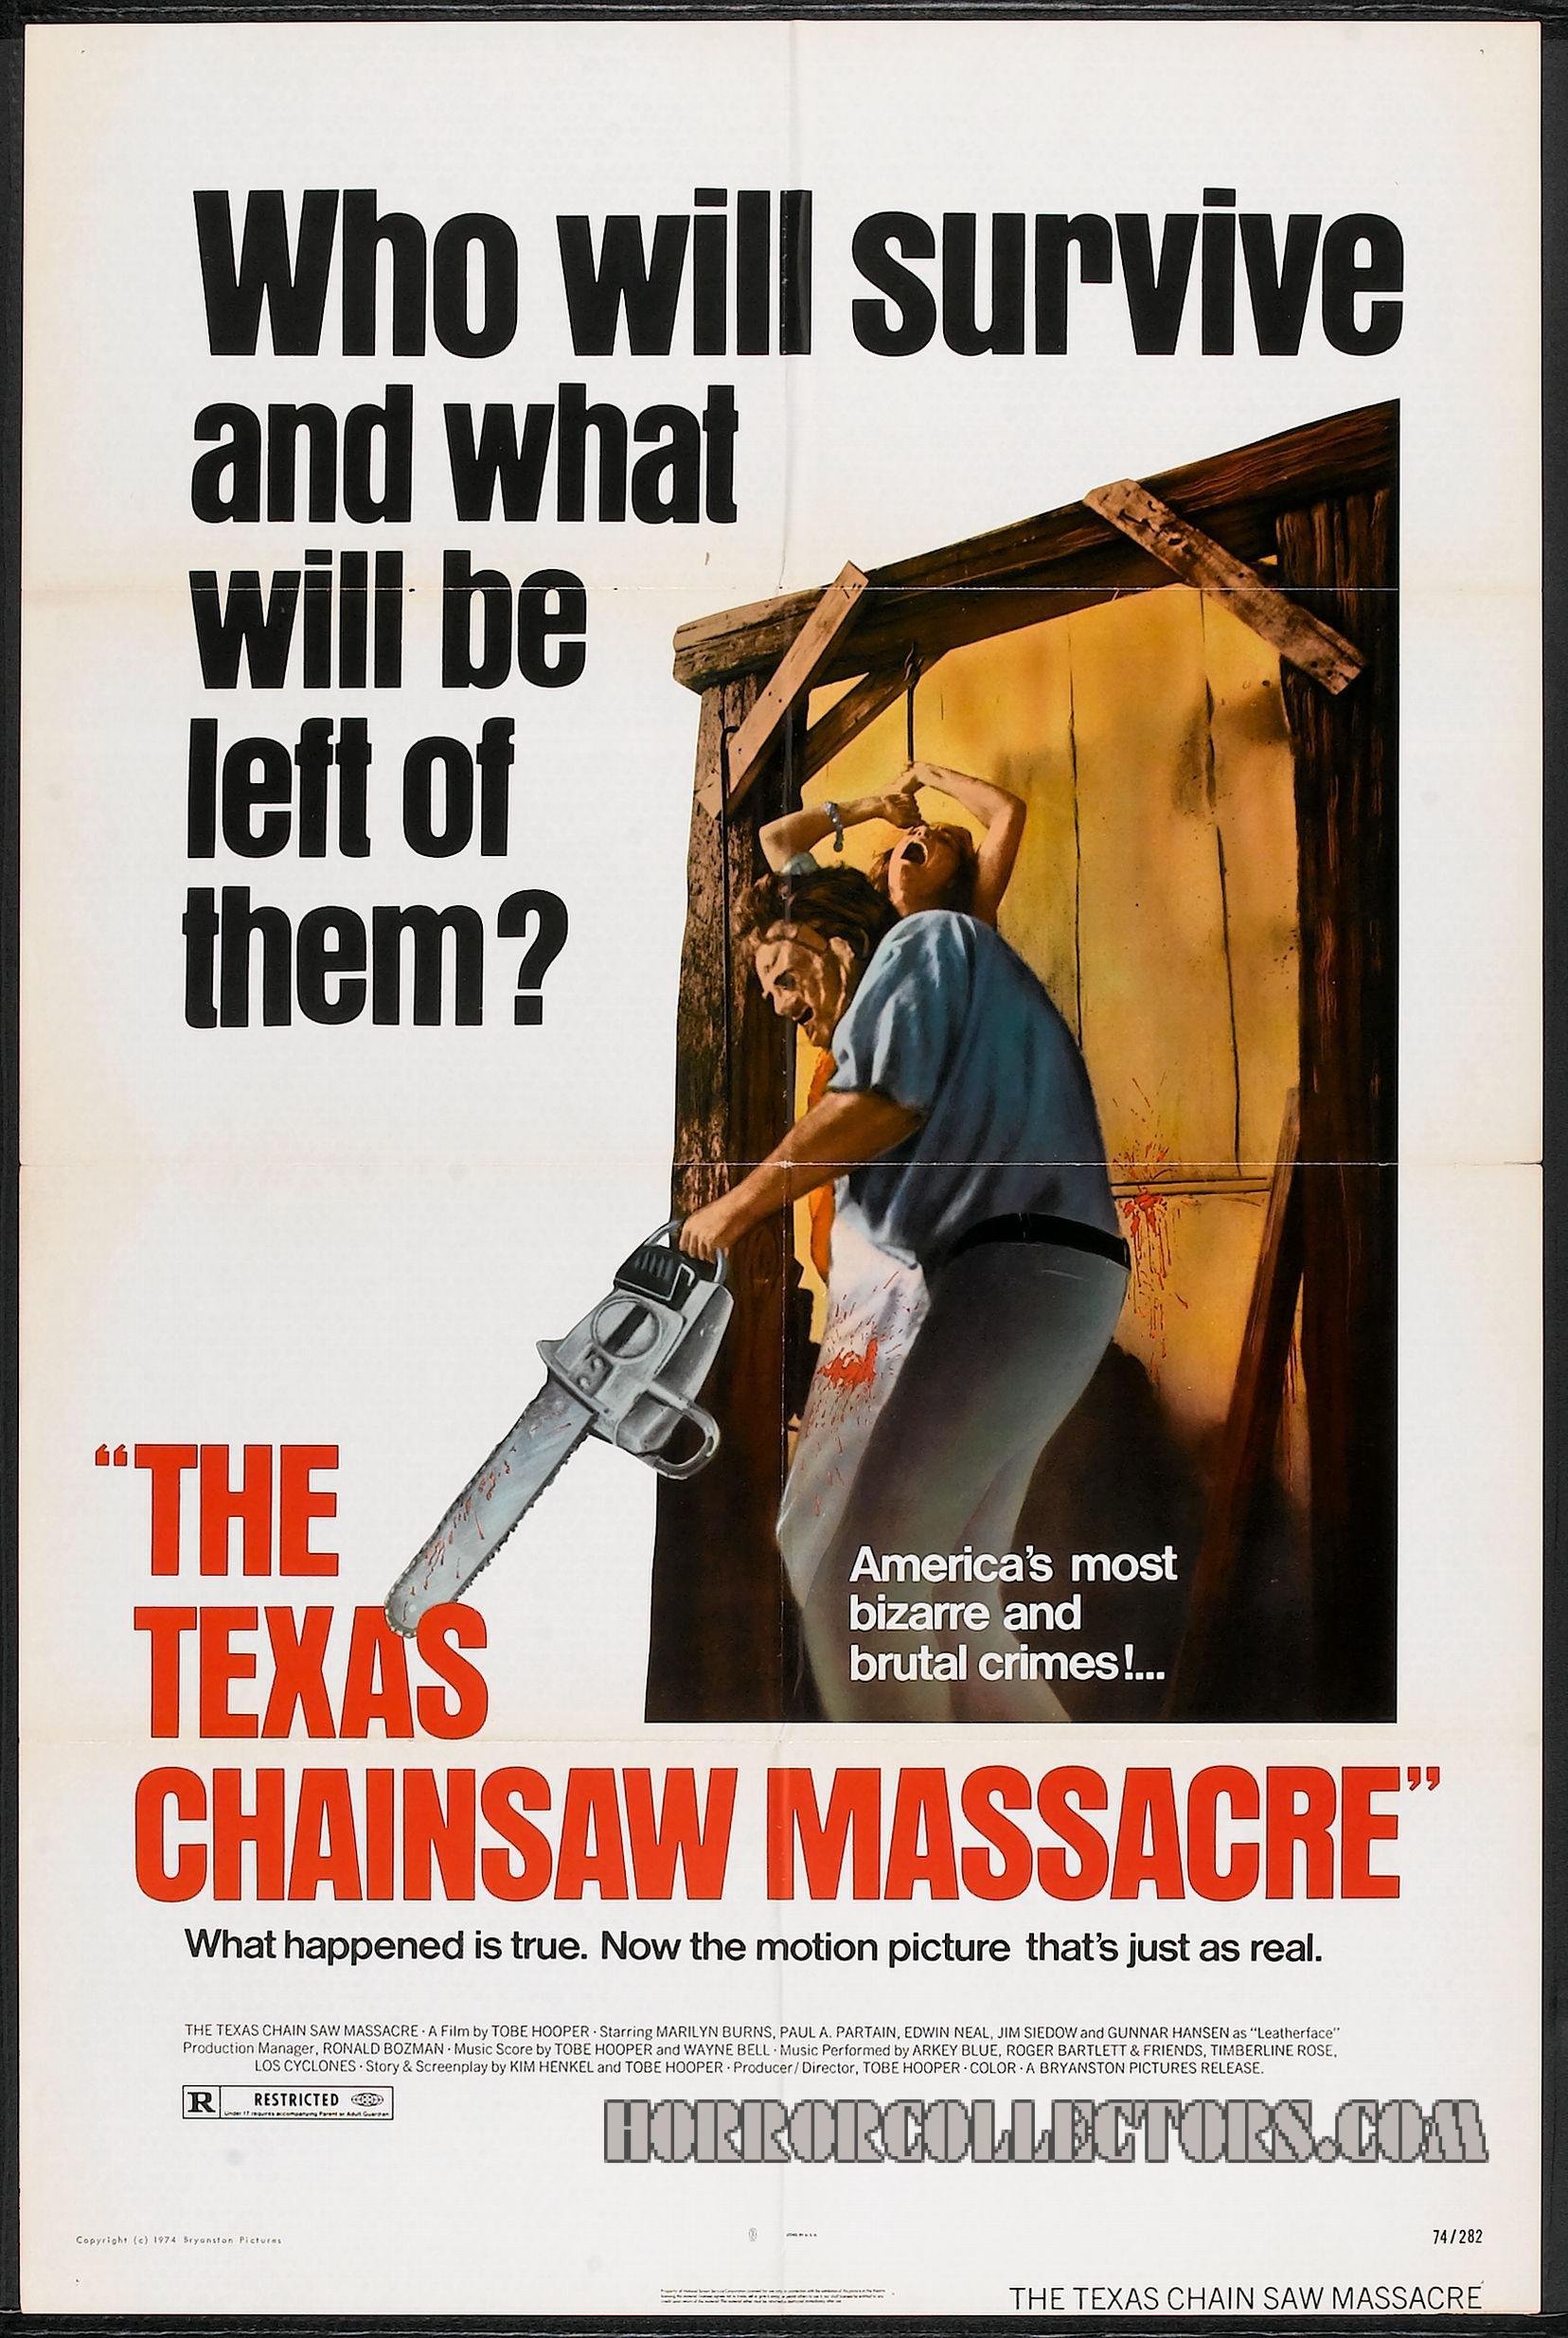 The Texas Chainsaw Massacre US Bryanston One sheet Poster